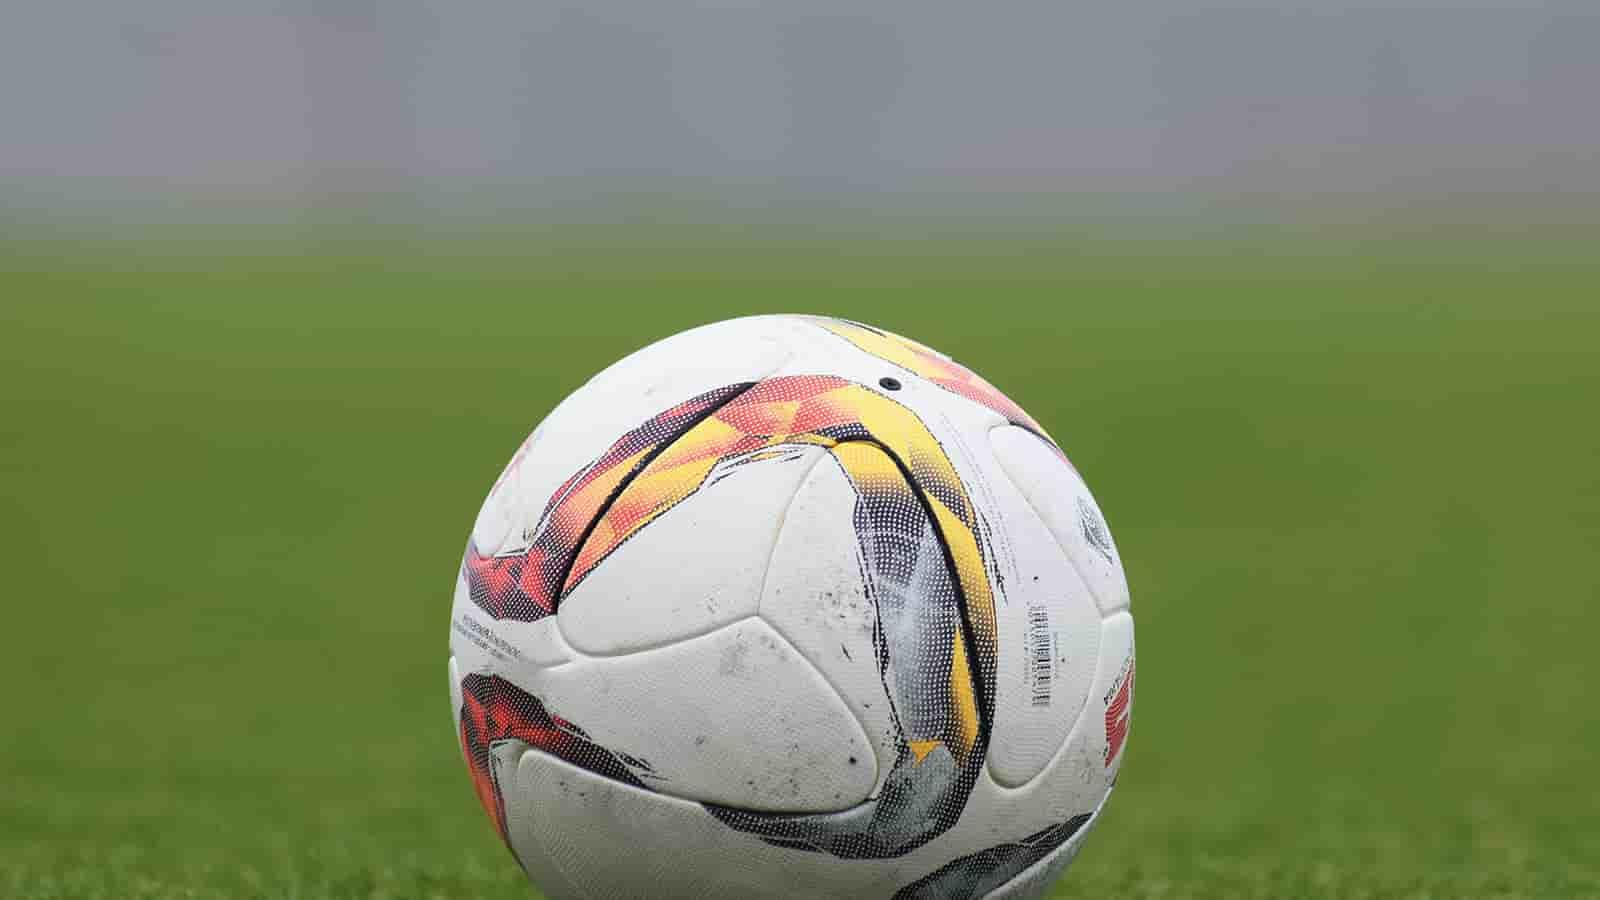 European Football Championship - Sweden vs Poland